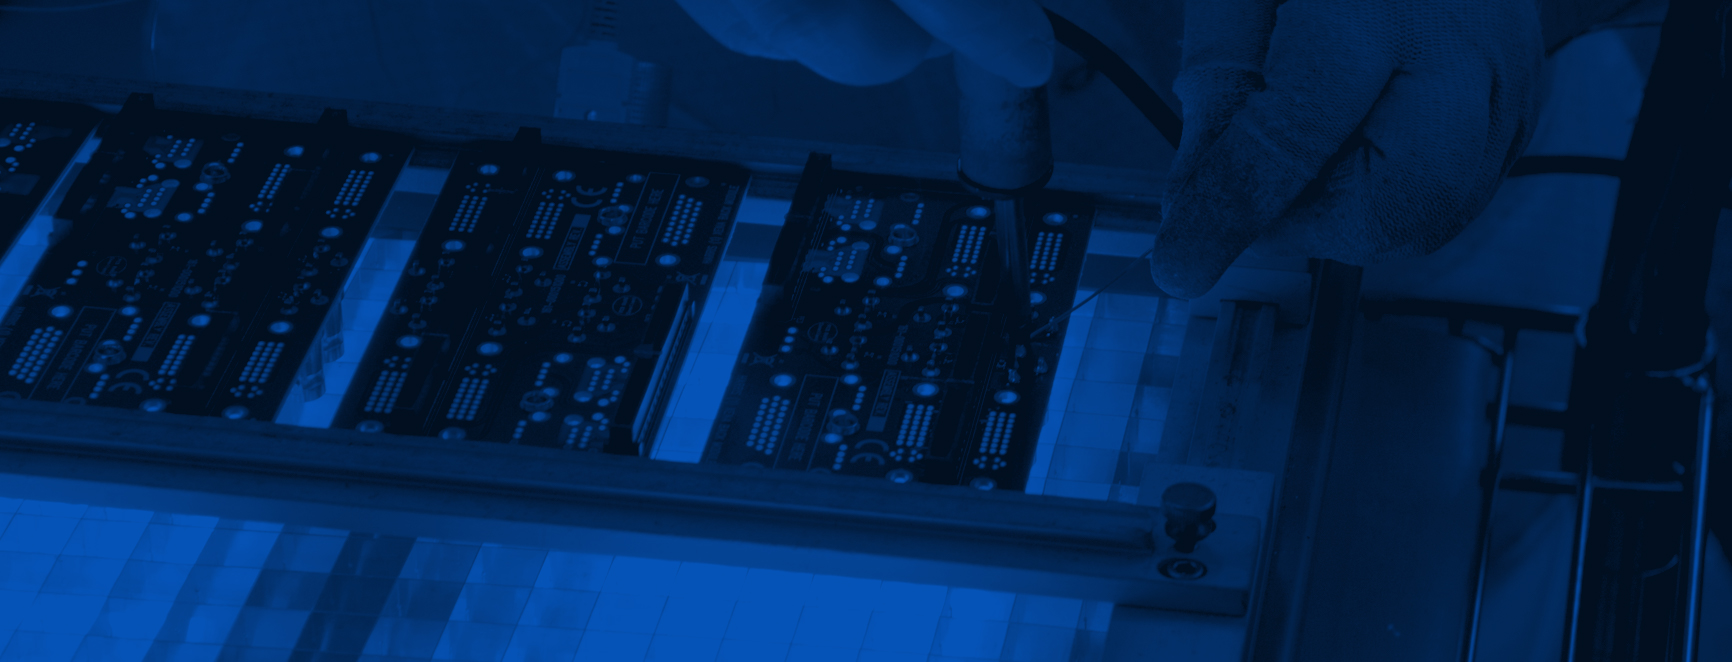 Electronics OEM Design & Manufacturing